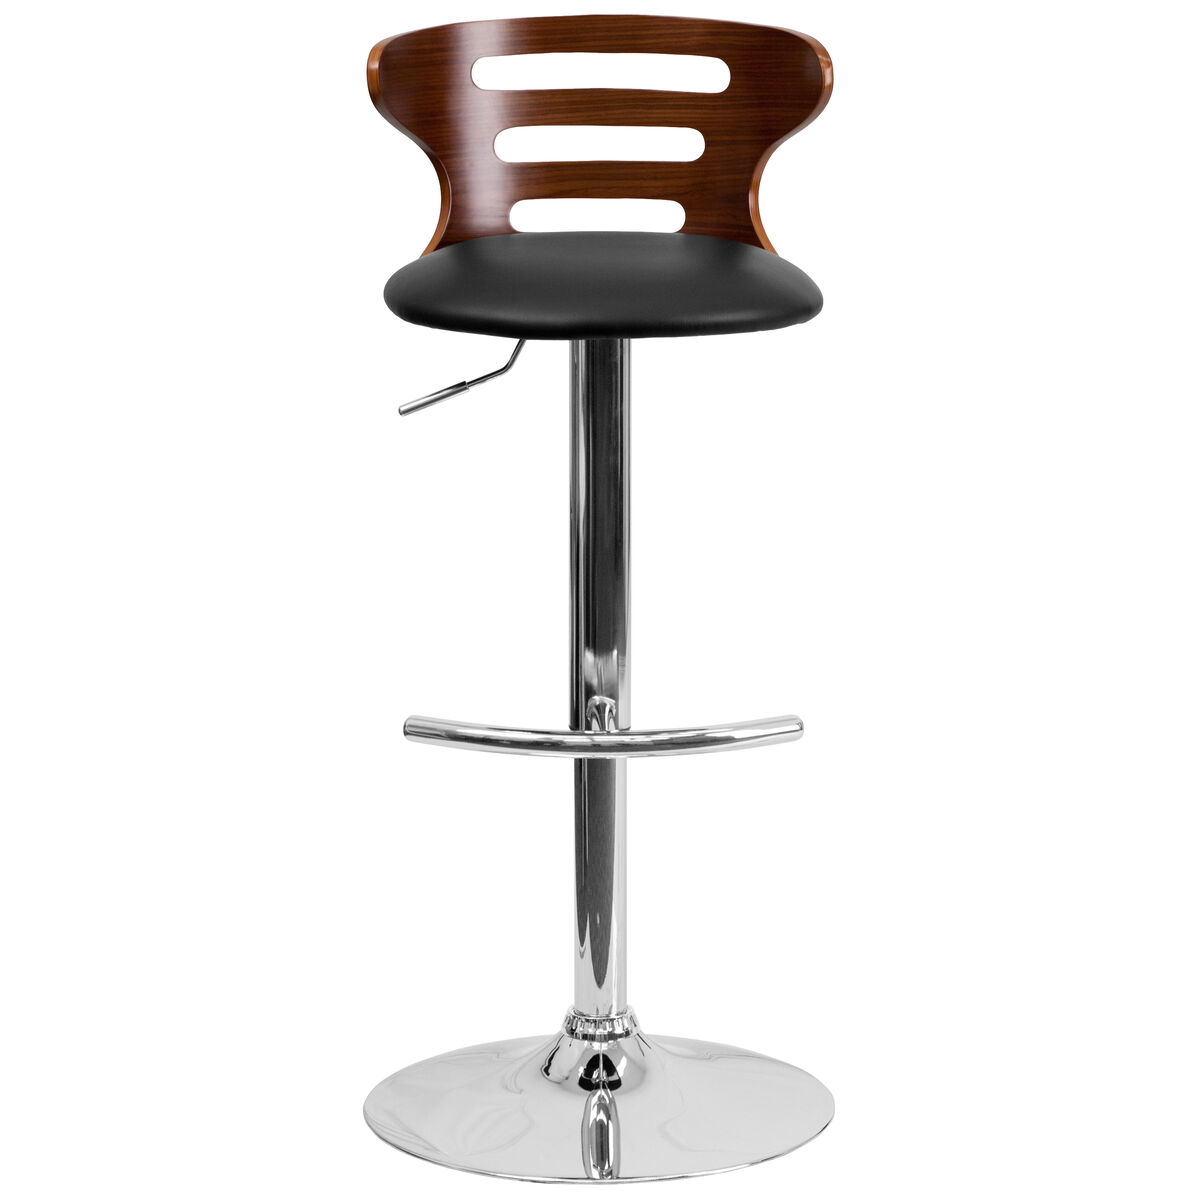 Walnut Bentwood Adjustable Height Barstool With Three Slot